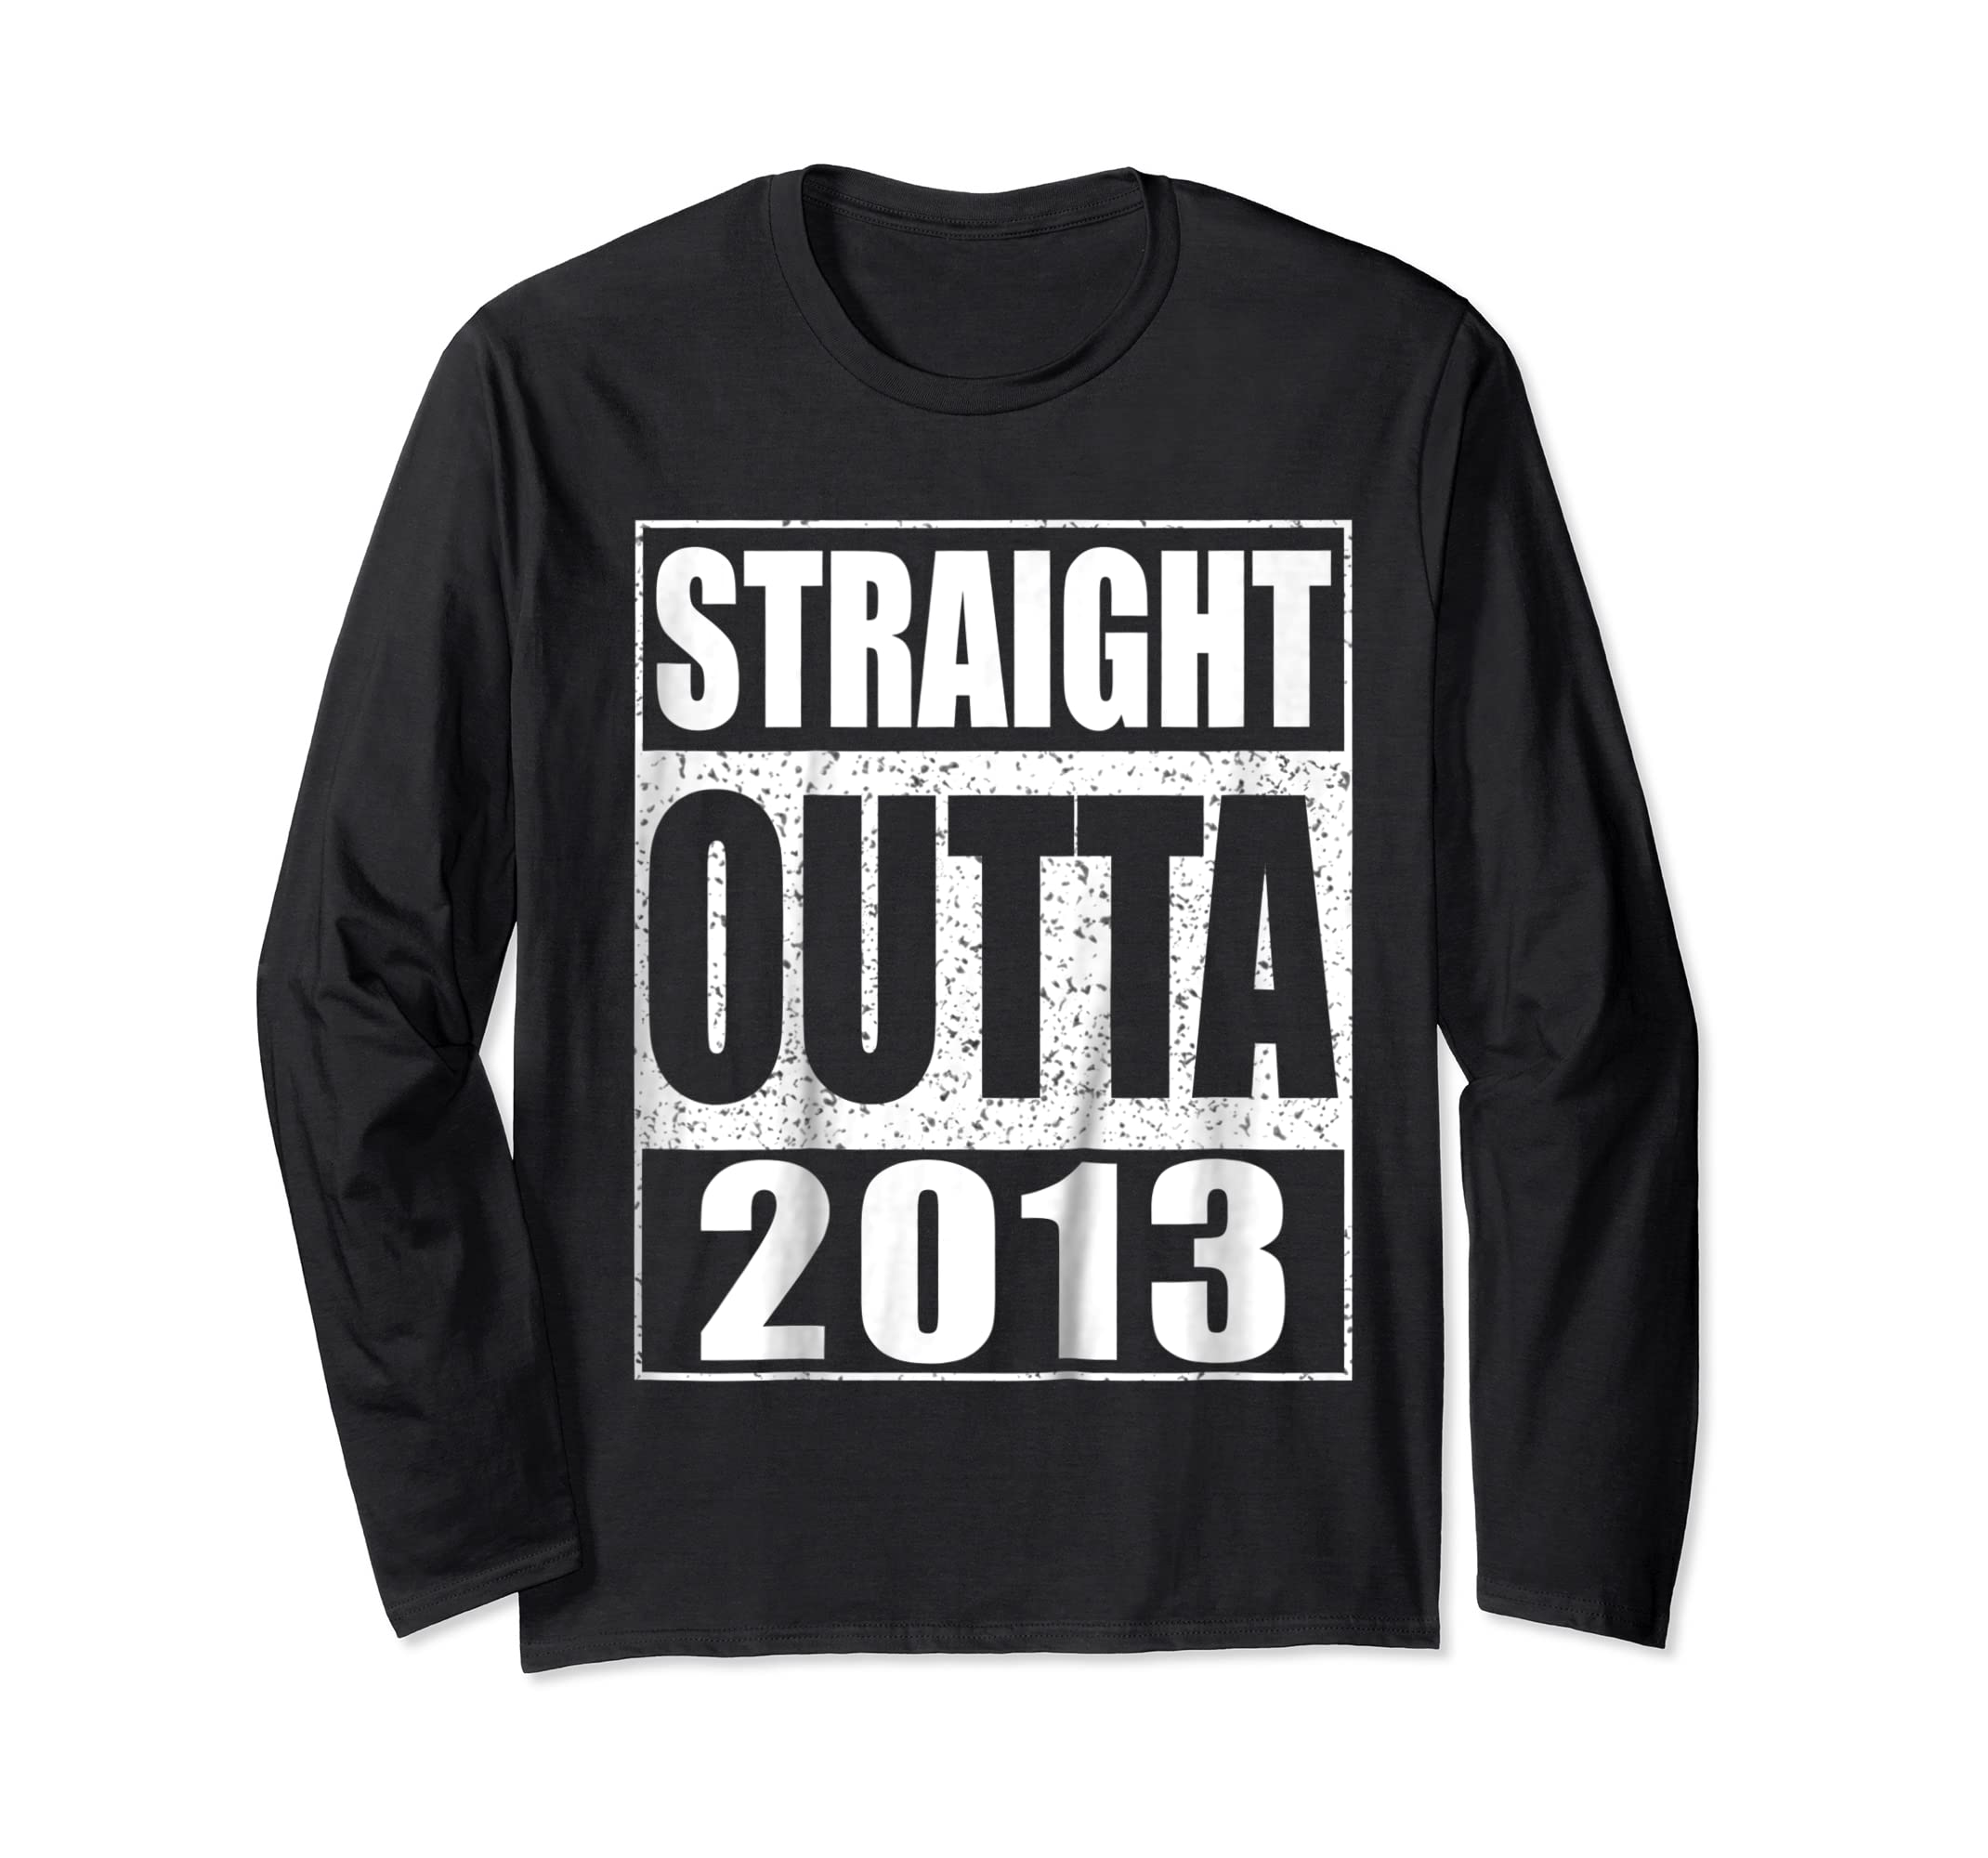 Kids Straight Outta 2013 T-Shirt 6th Birthday Gift Shirt-Long Sleeve-Black